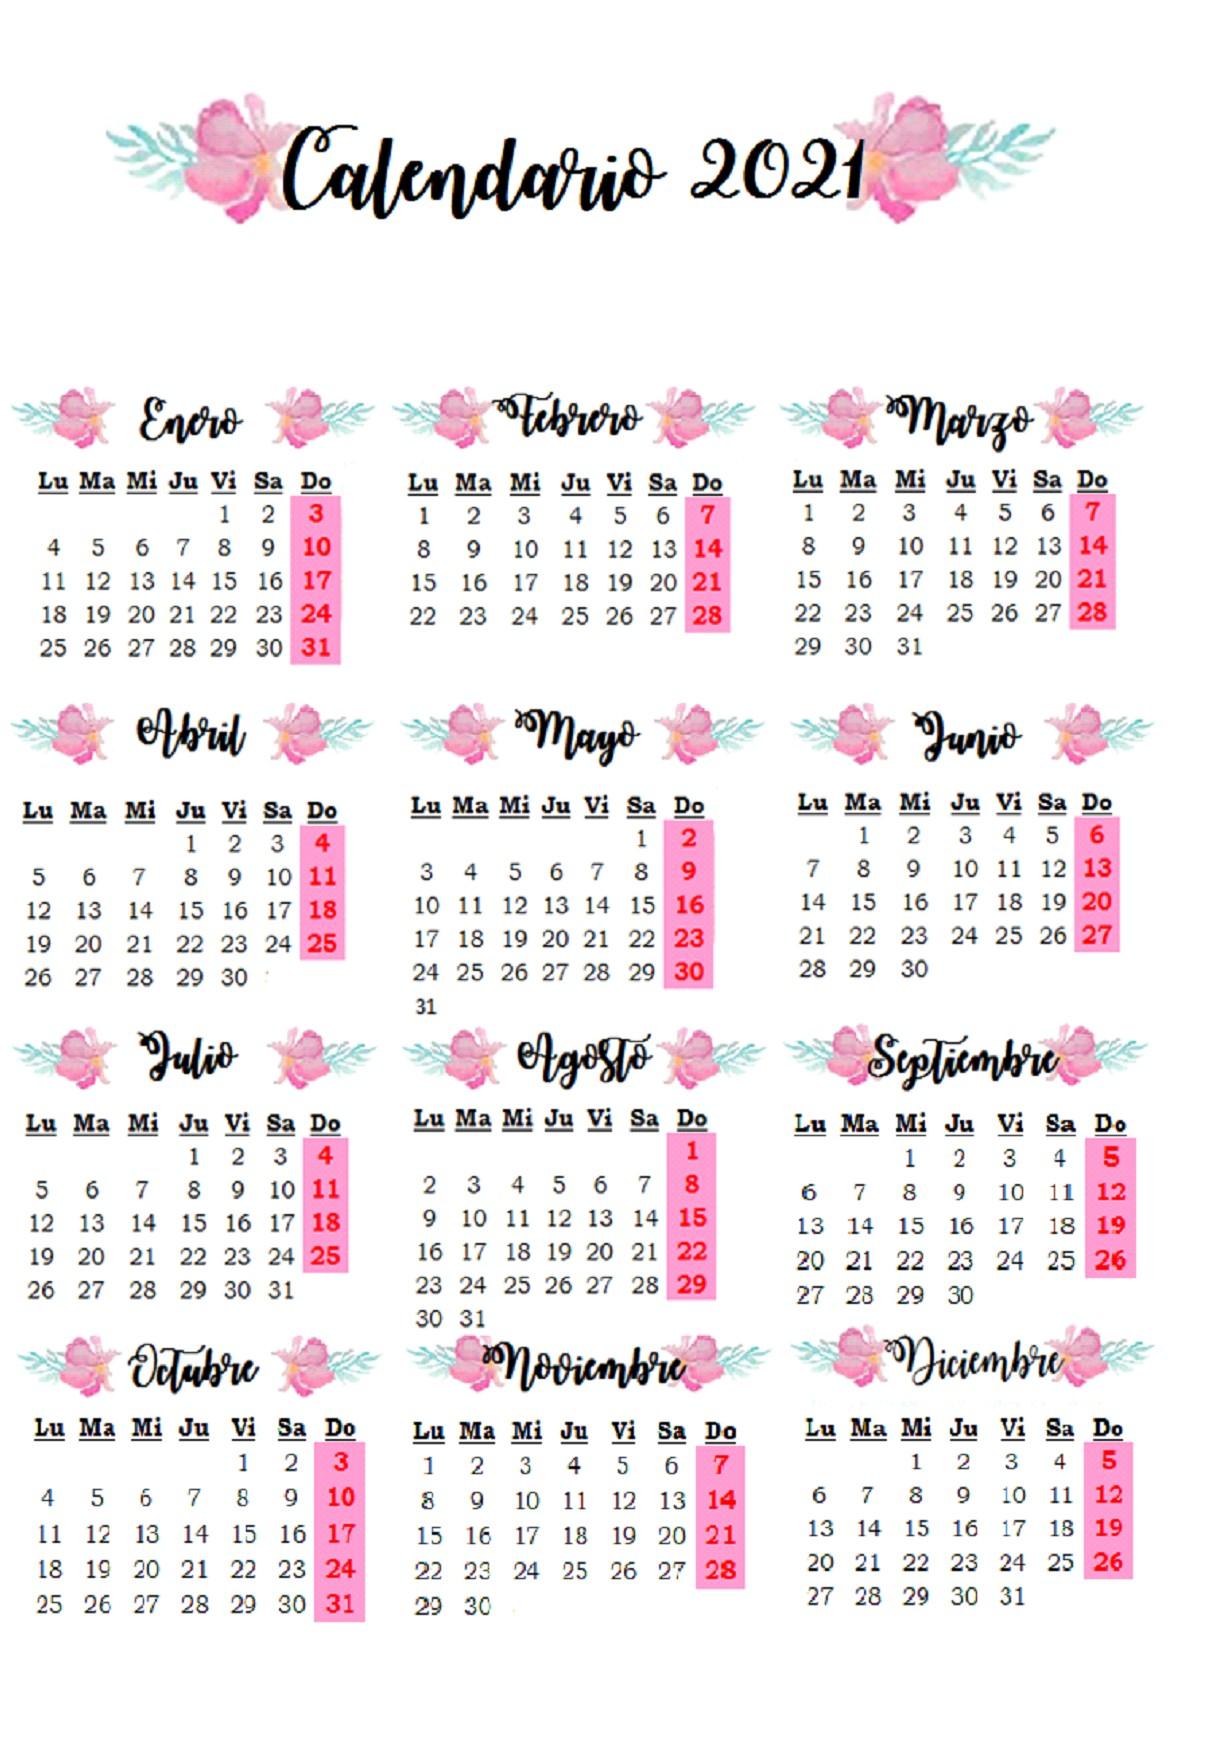 Calendario De Mayo 2017 Para Imprimir Gratis Más Actual Realmente Esto Imprimir Calendario 2017 Mexico Calendario 2019